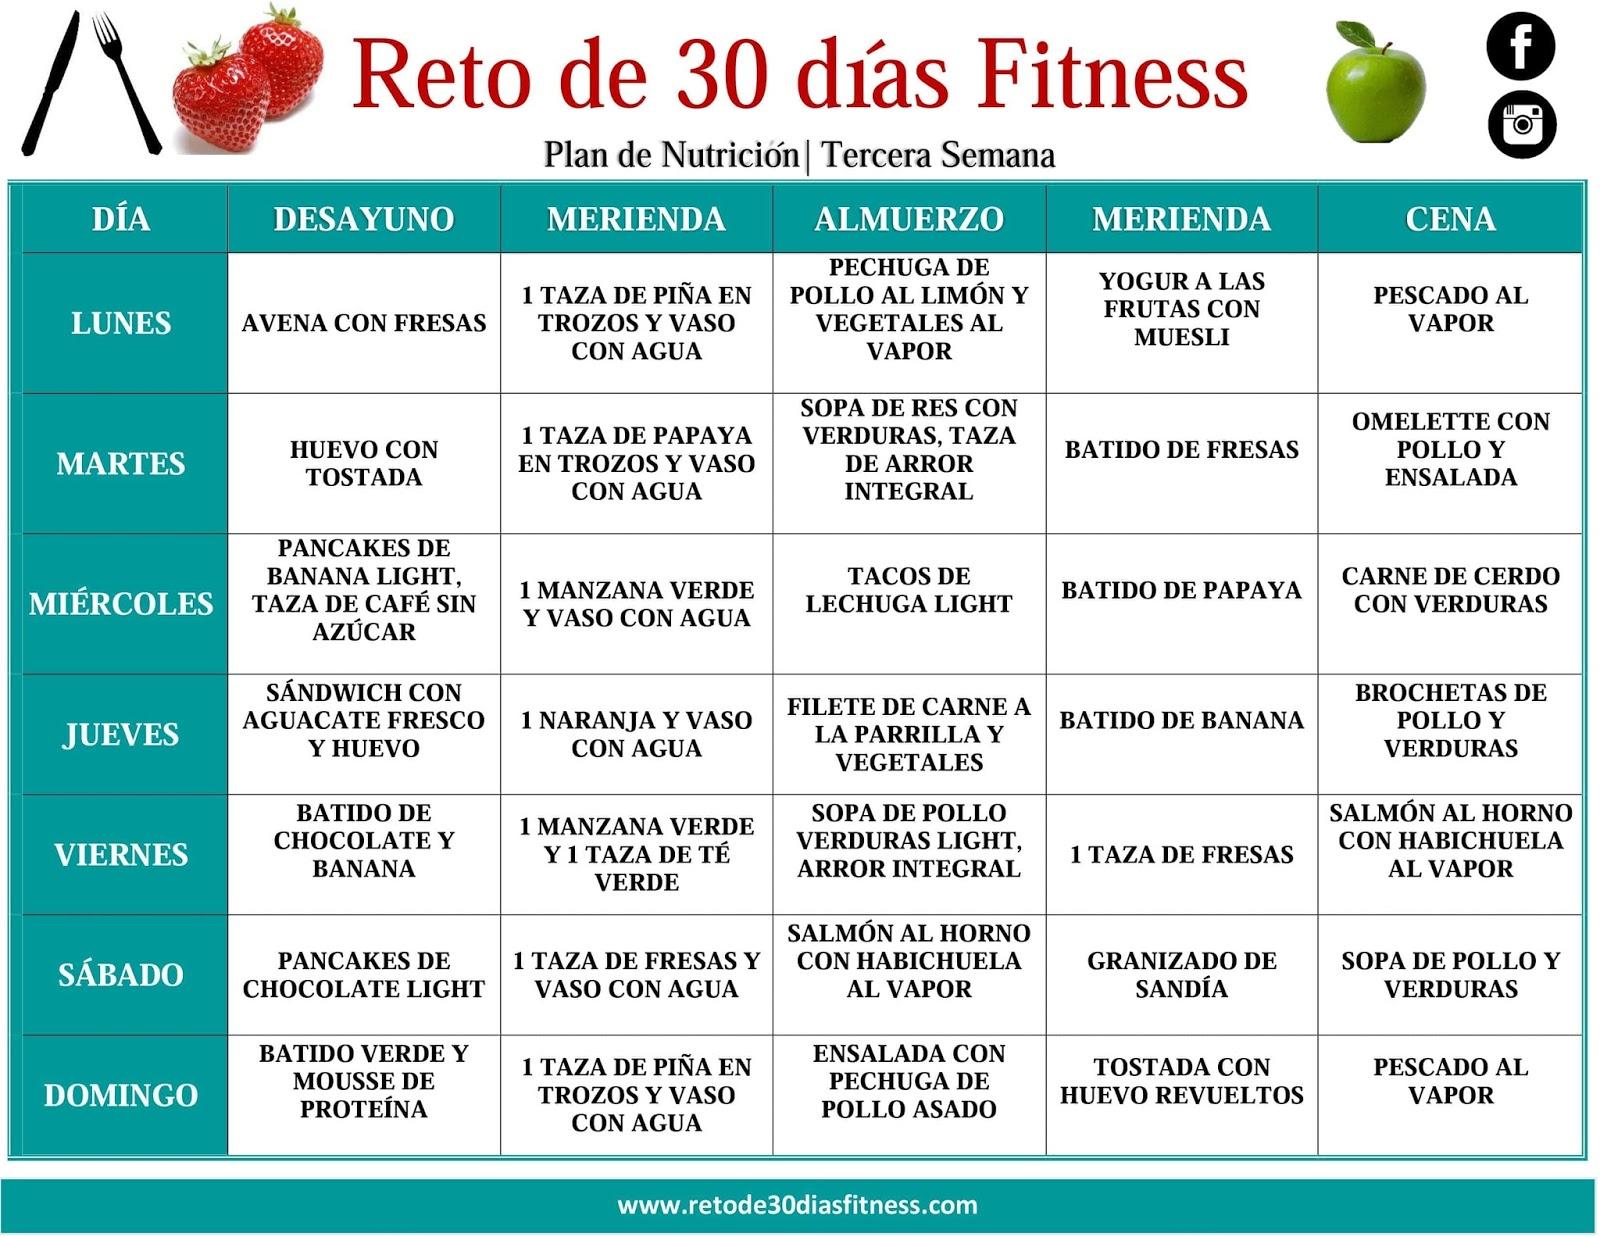 plan nutricional para bajar de peso tercera semana